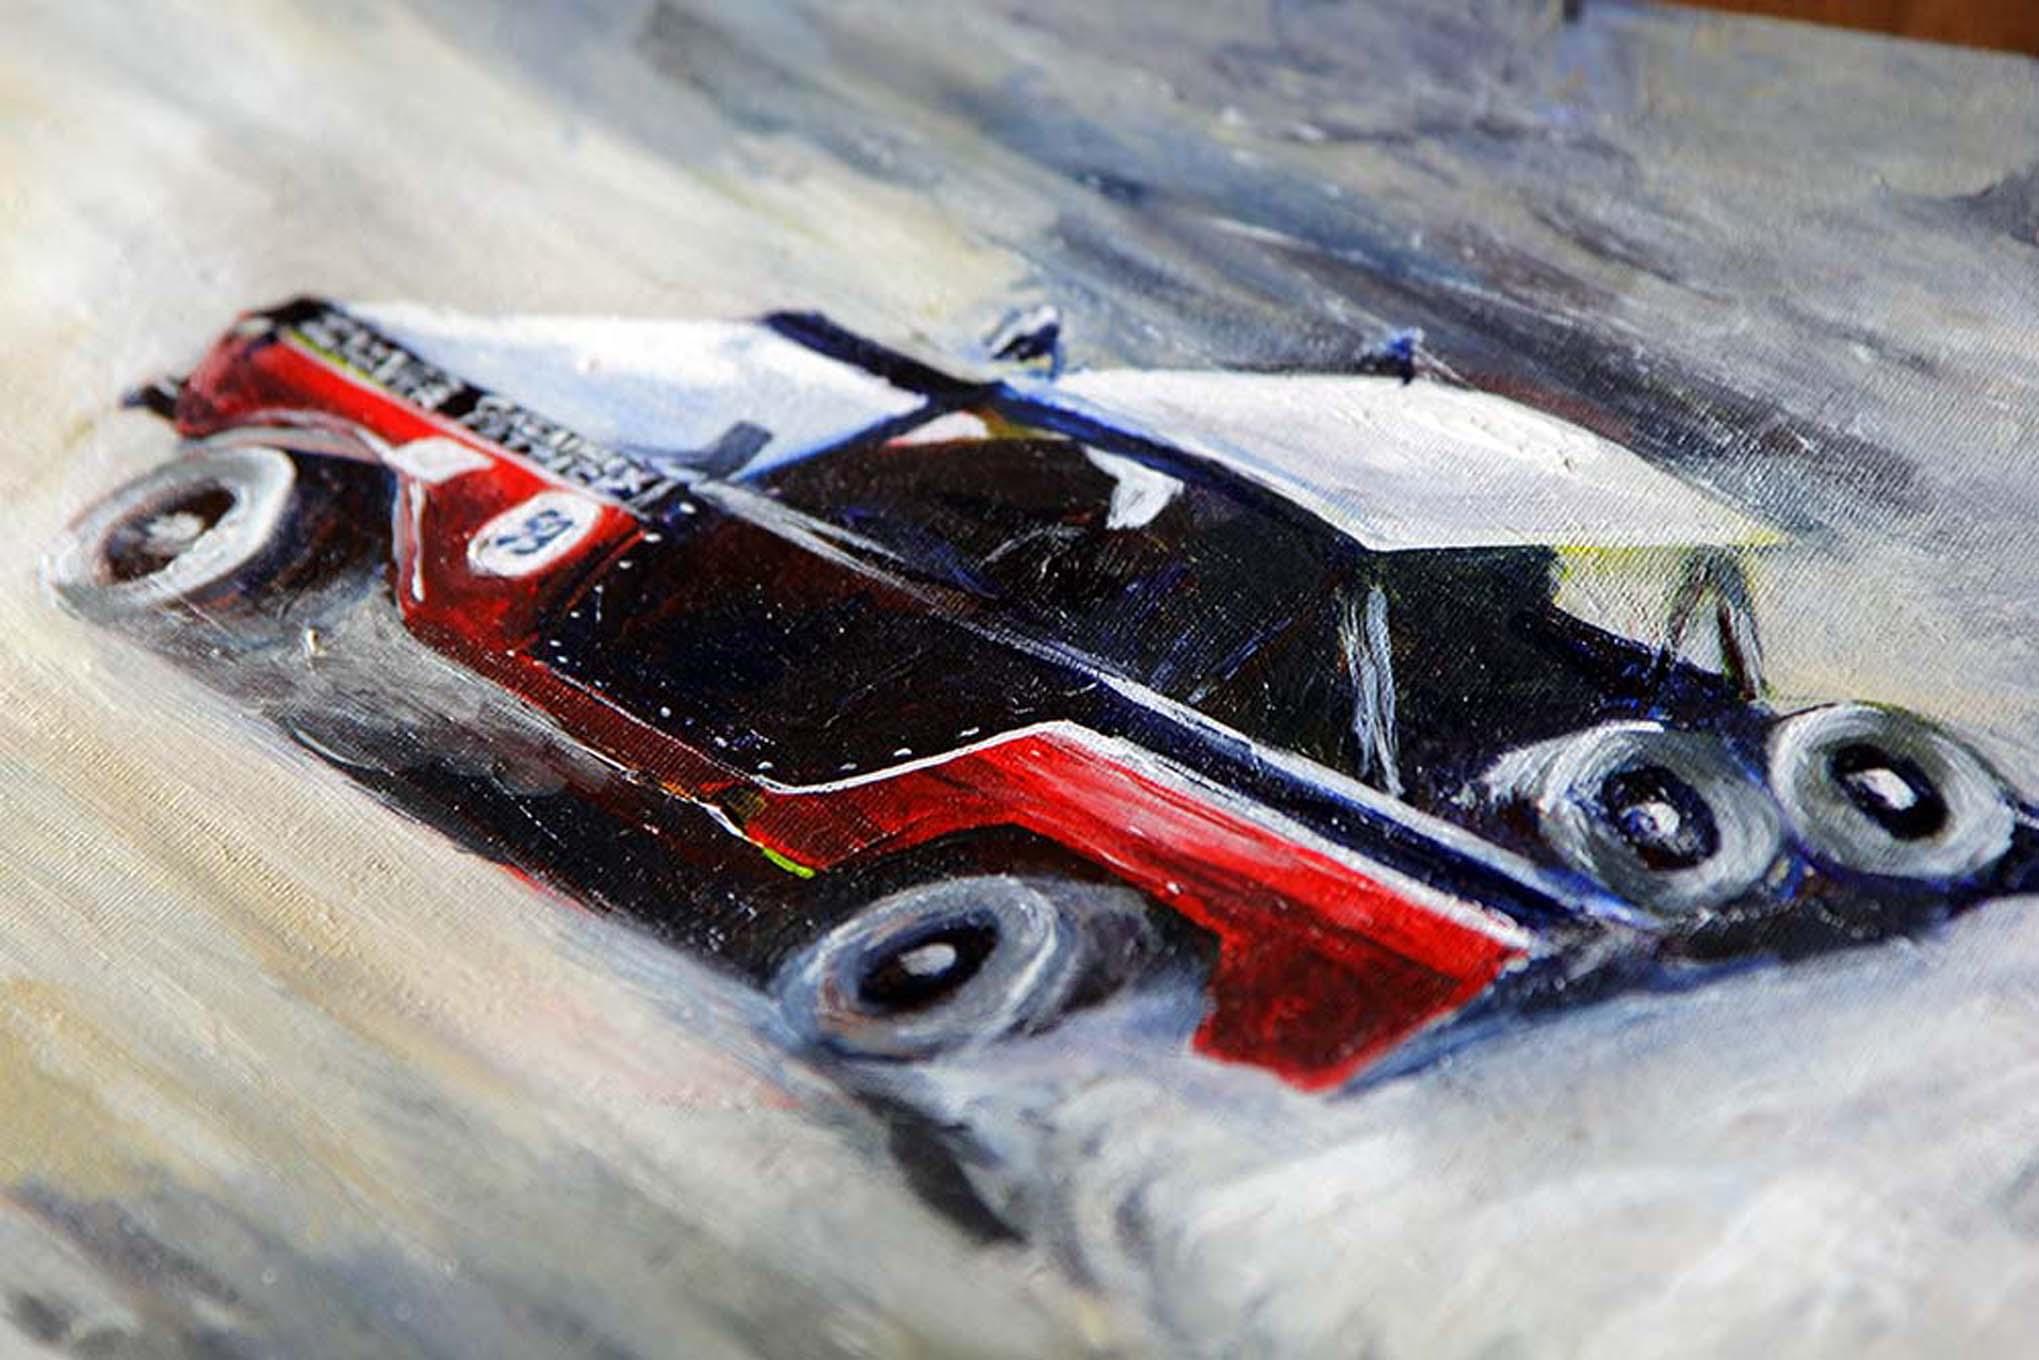 025NORRA Mexican 1000 BAJA offroad Race 2015 Manx Nova Chevy James Garner